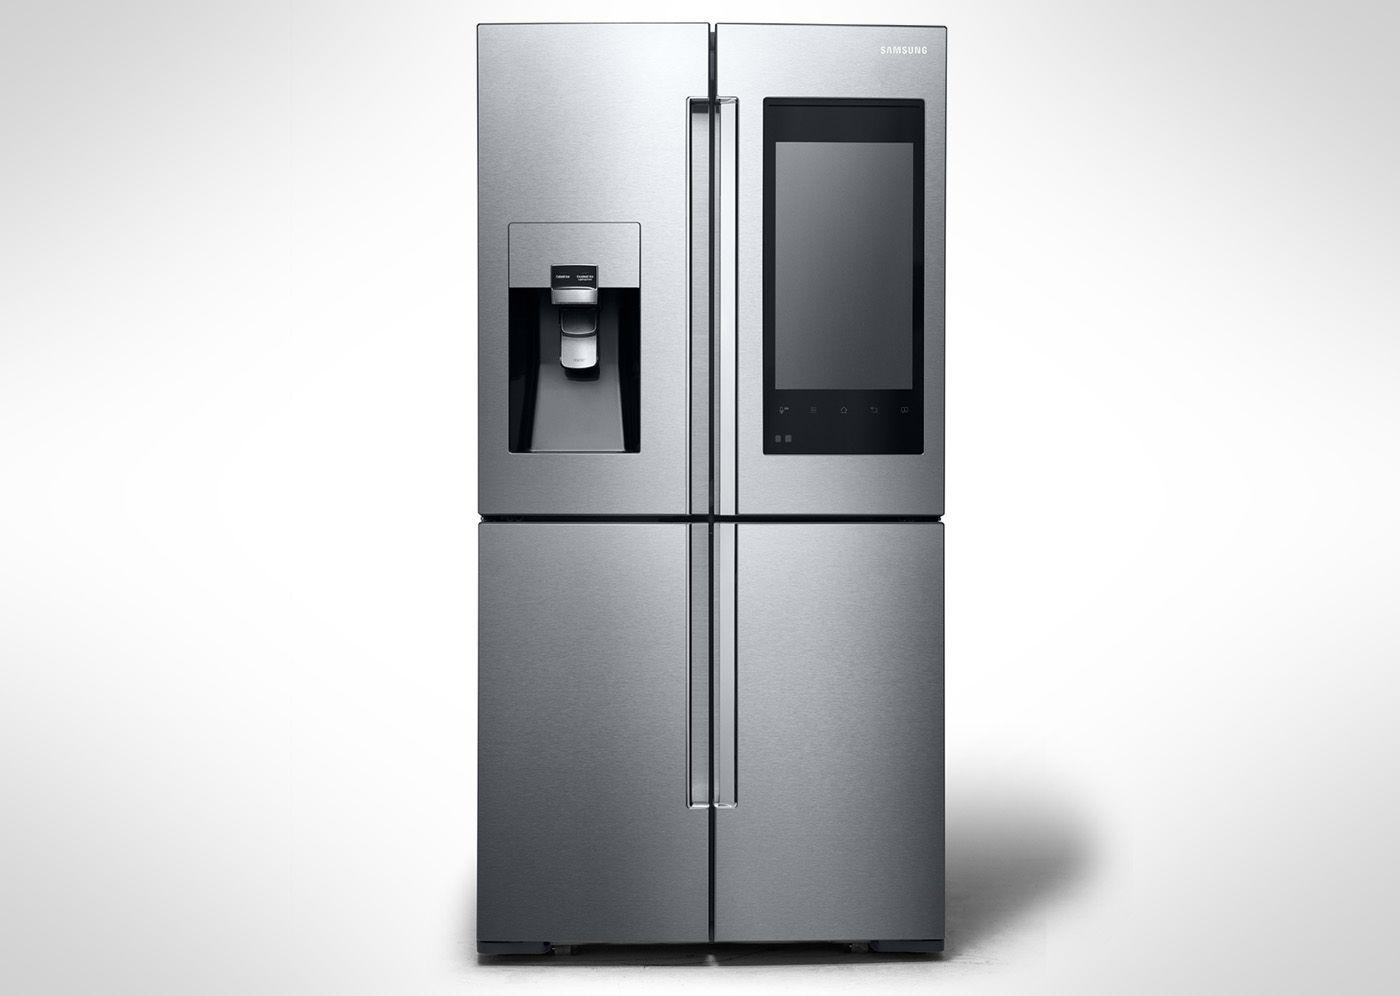 Huge Refrigerator Samsungs Latest Smart Fridge Has Cameras And A Huge Display